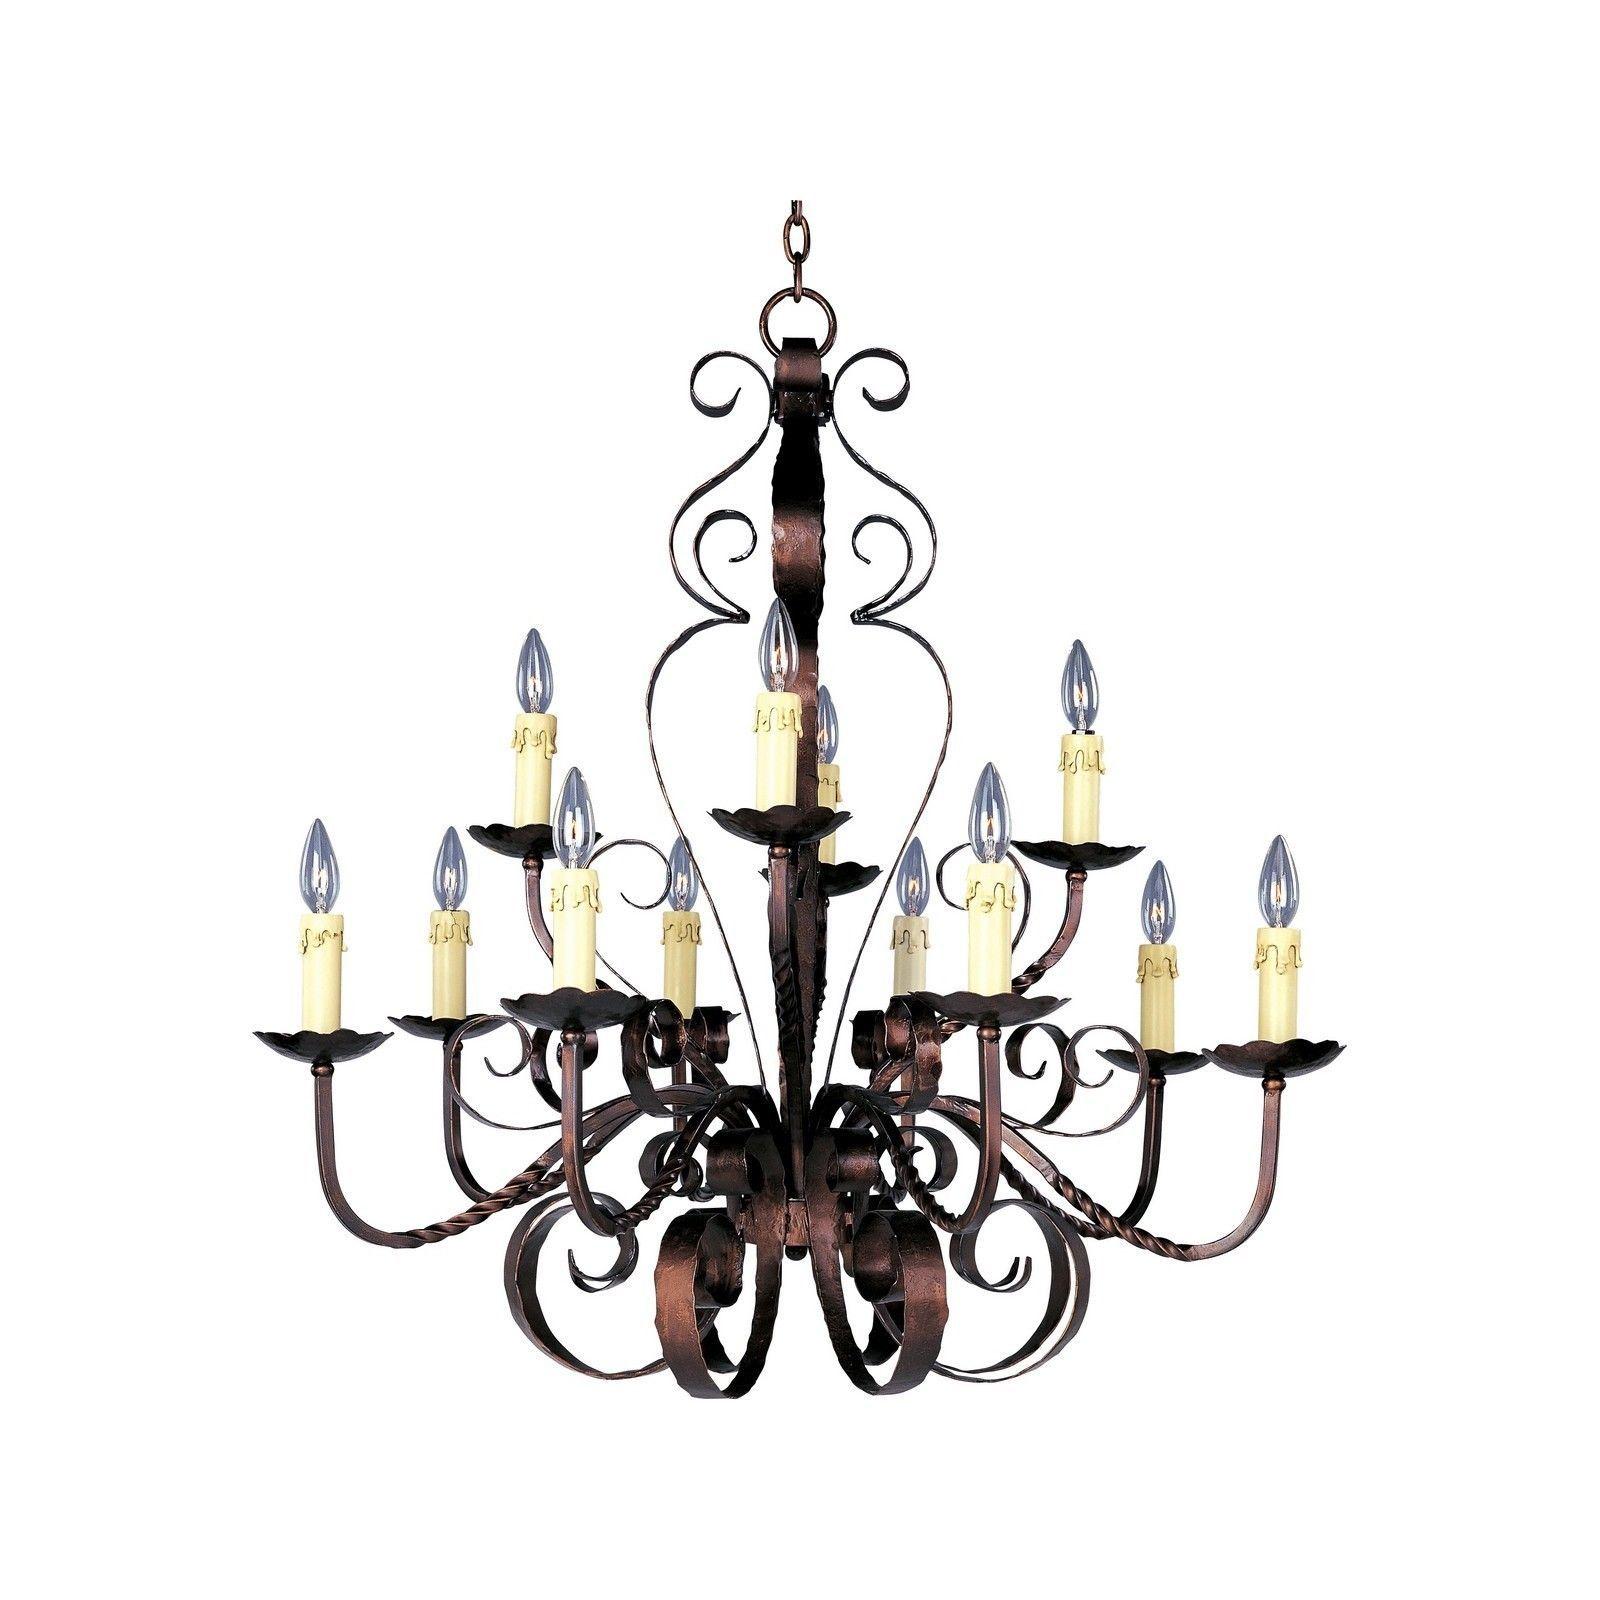 Maxim aspen bronze 12 light chandelier aspen 12 light chandelier maxim aspen bronze 12 light chandelier aspen 12 light chandelier iron arubaitofo Choice Image